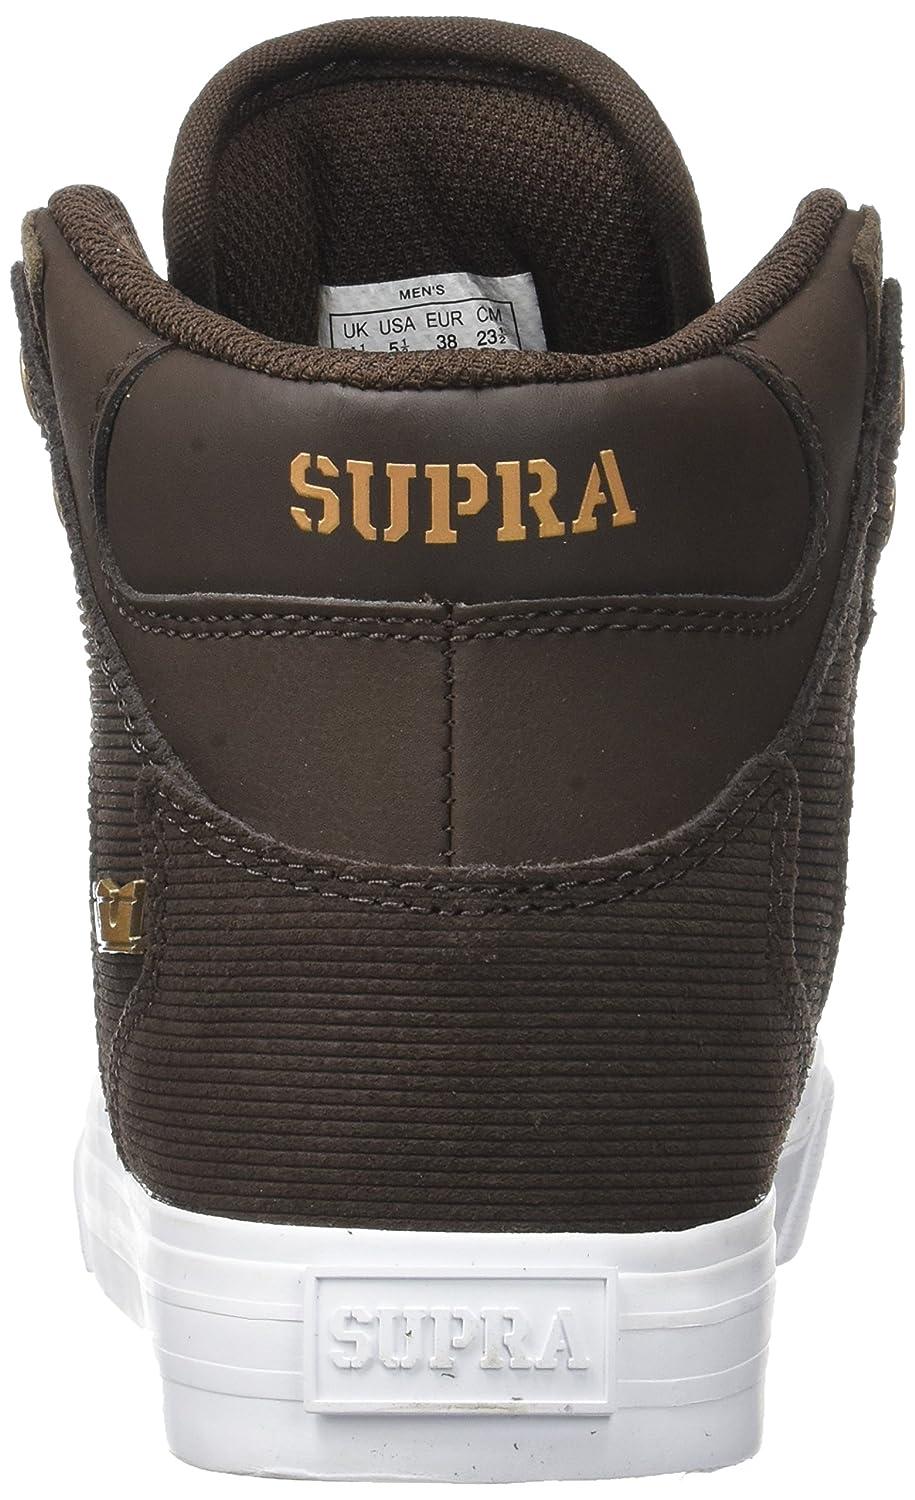 Supra Vaider LC Sneaker B06XYBJ5WJ 10 Women /+D409:D437  8.5 Men M US|Demitasse Suede/Copper/Copper/White